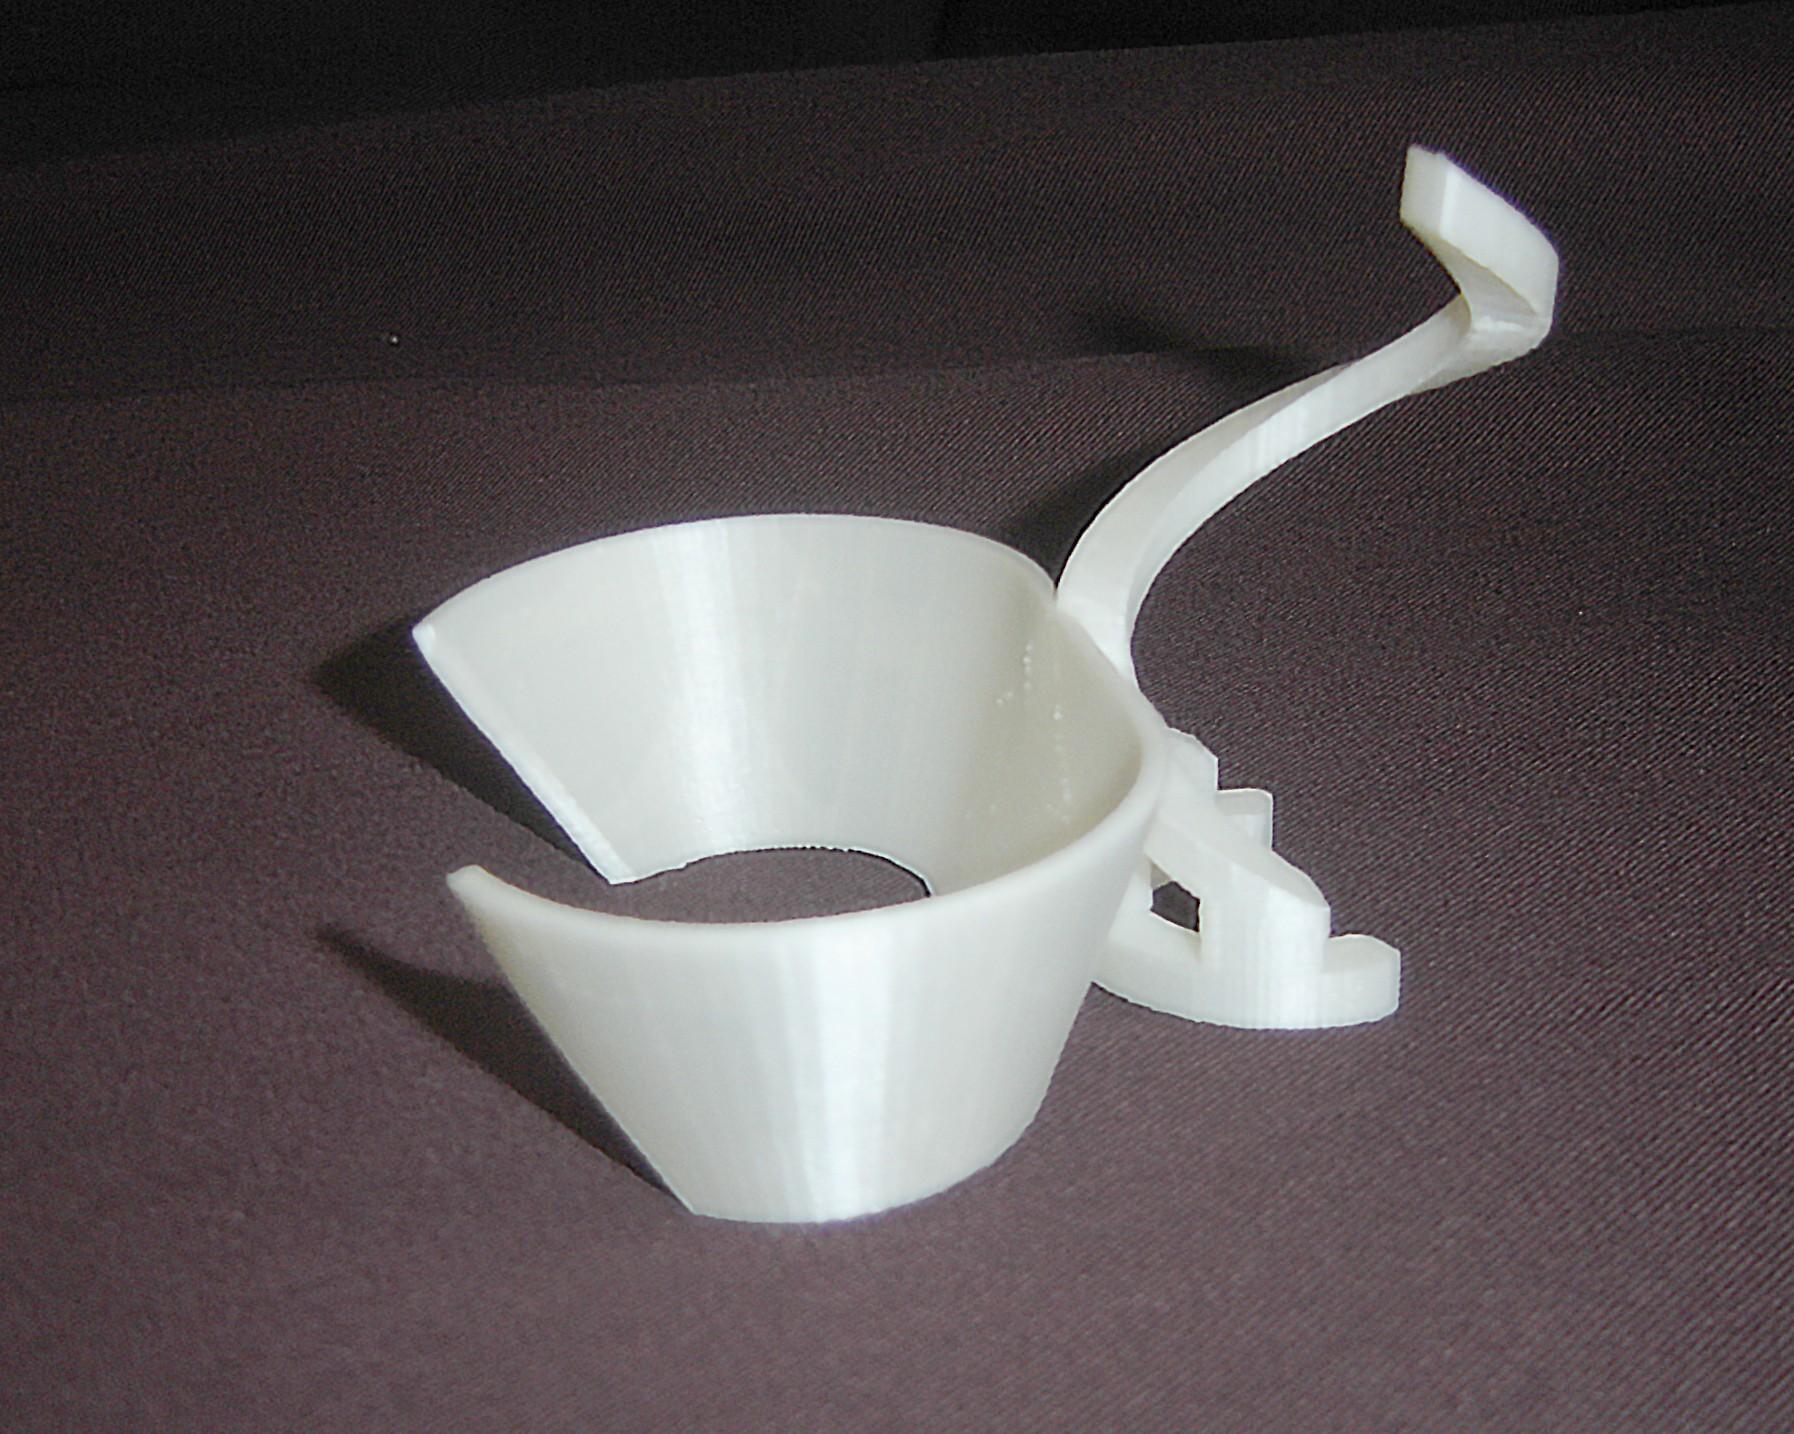 Hook_shower00.jpg Download free STL file SOAP HOLDER FOR SHOWER WITHOUT FIXING • 3D printable template, Vince3D